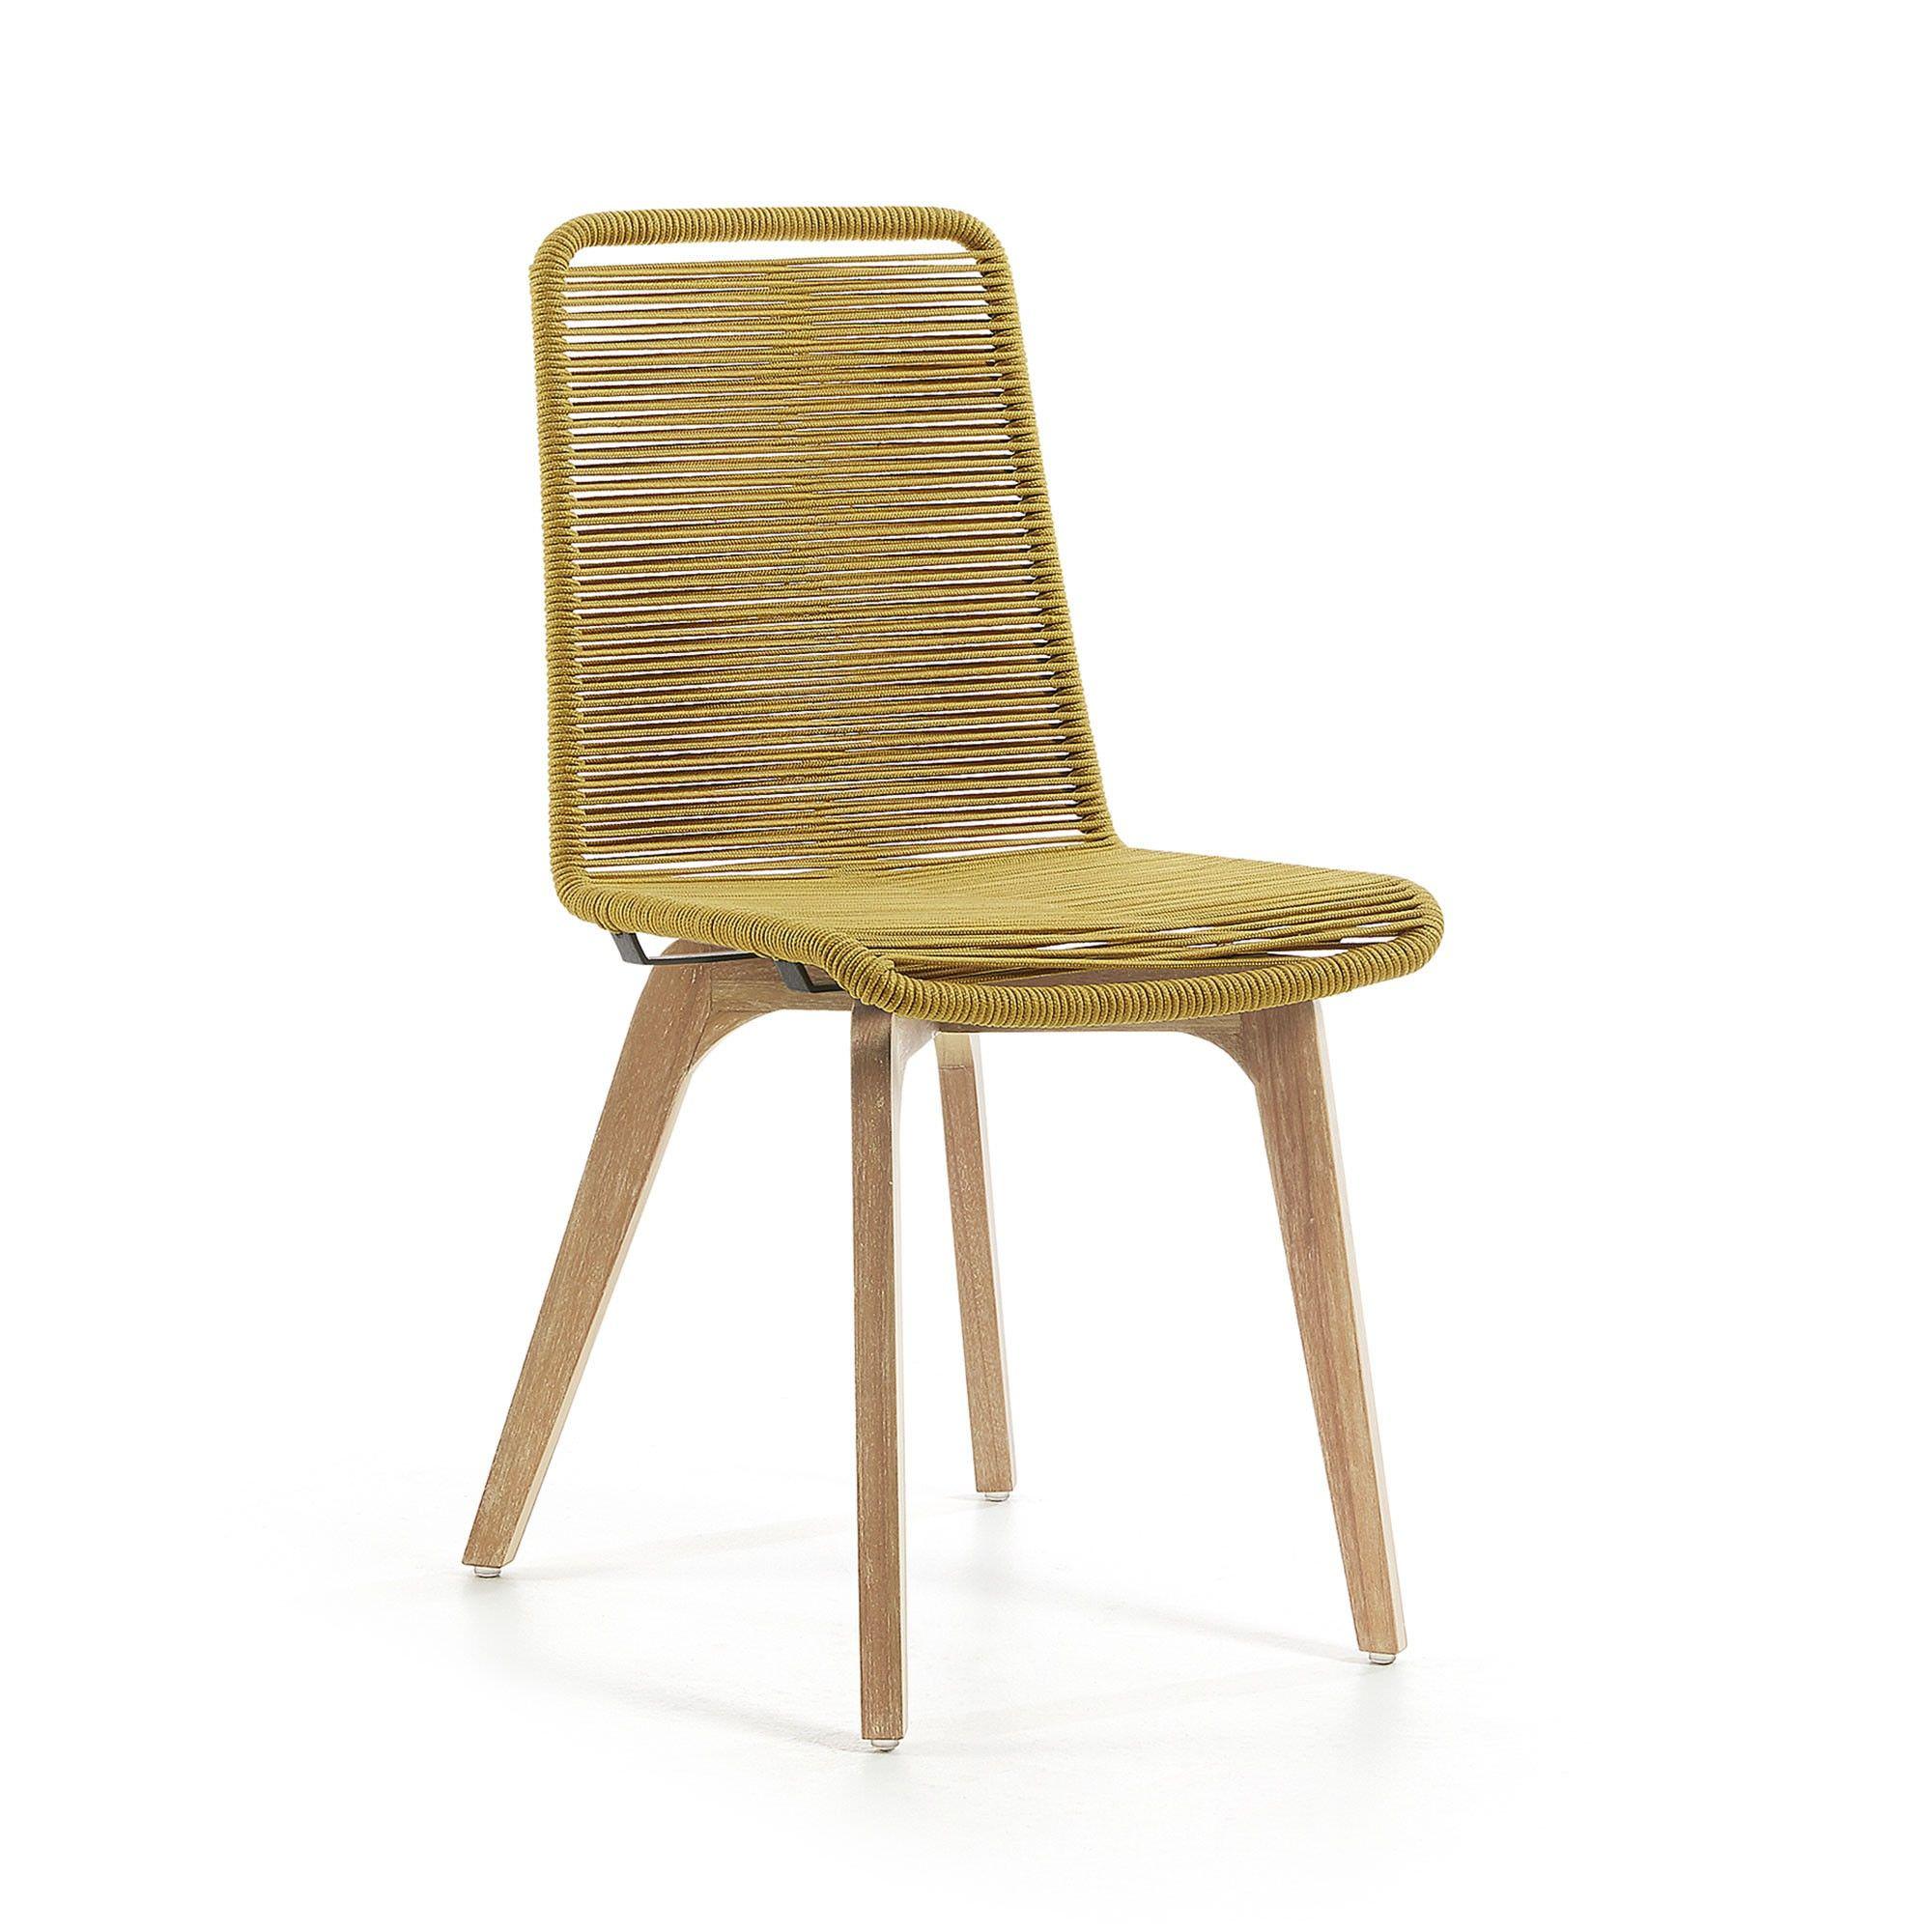 Gibson Rope & Eucalyptus Timber Indoor / Outdoor Dining Chair, Mustard